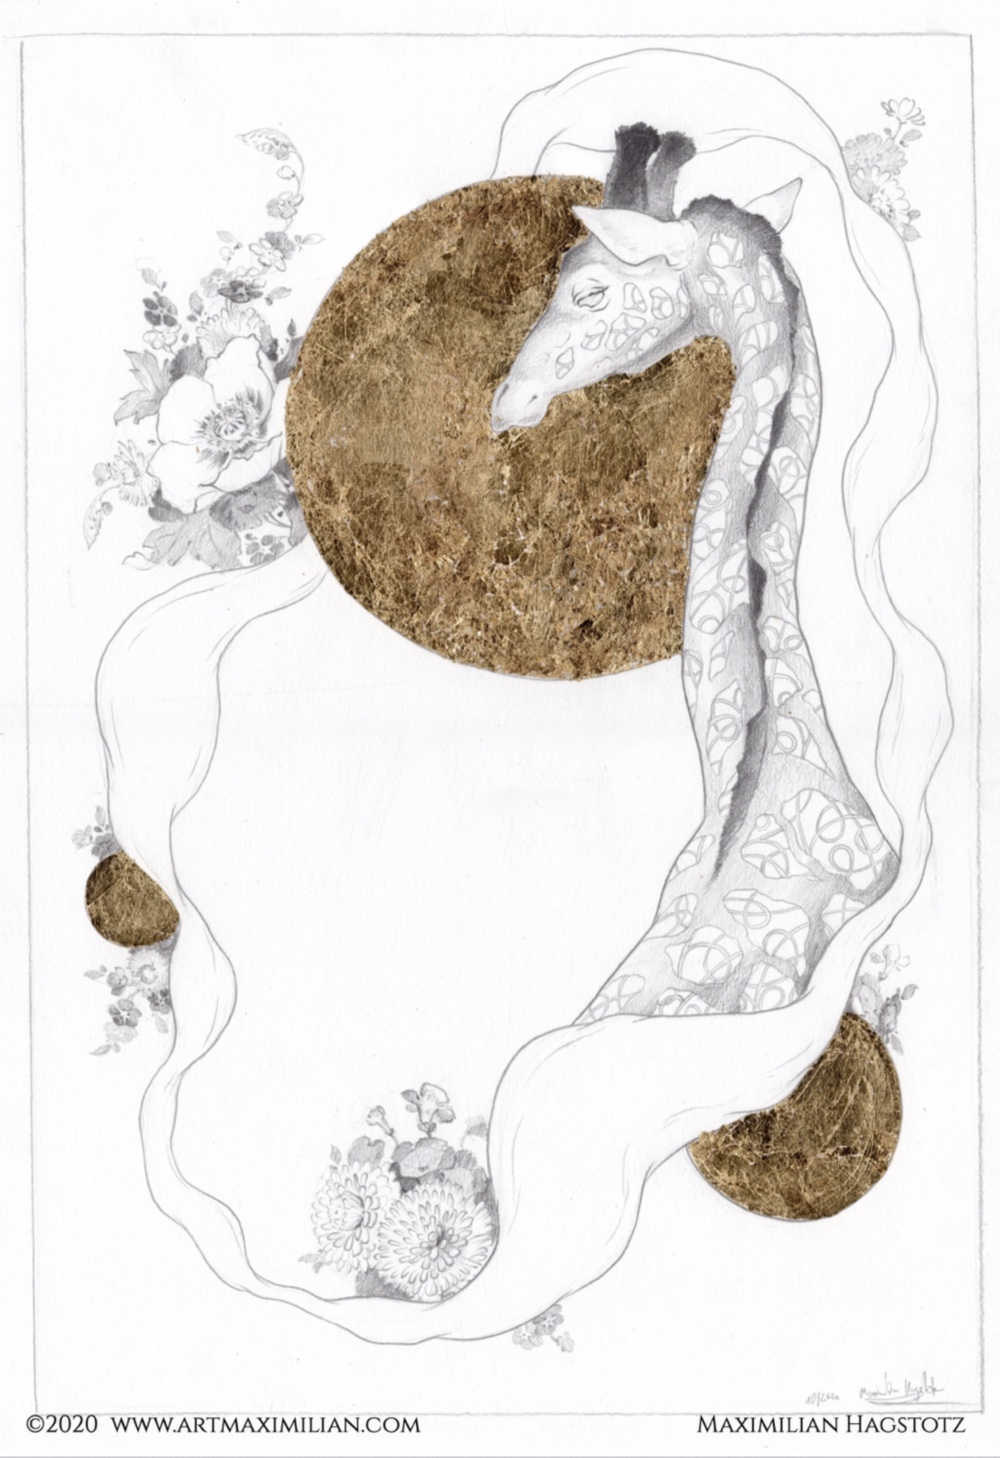 Zeichnung Grafik Neu Bleistift Gold Unikat Maximilian Hagstotz Blumen sonne Afrika Big five 5 Giraffe Muster ornament